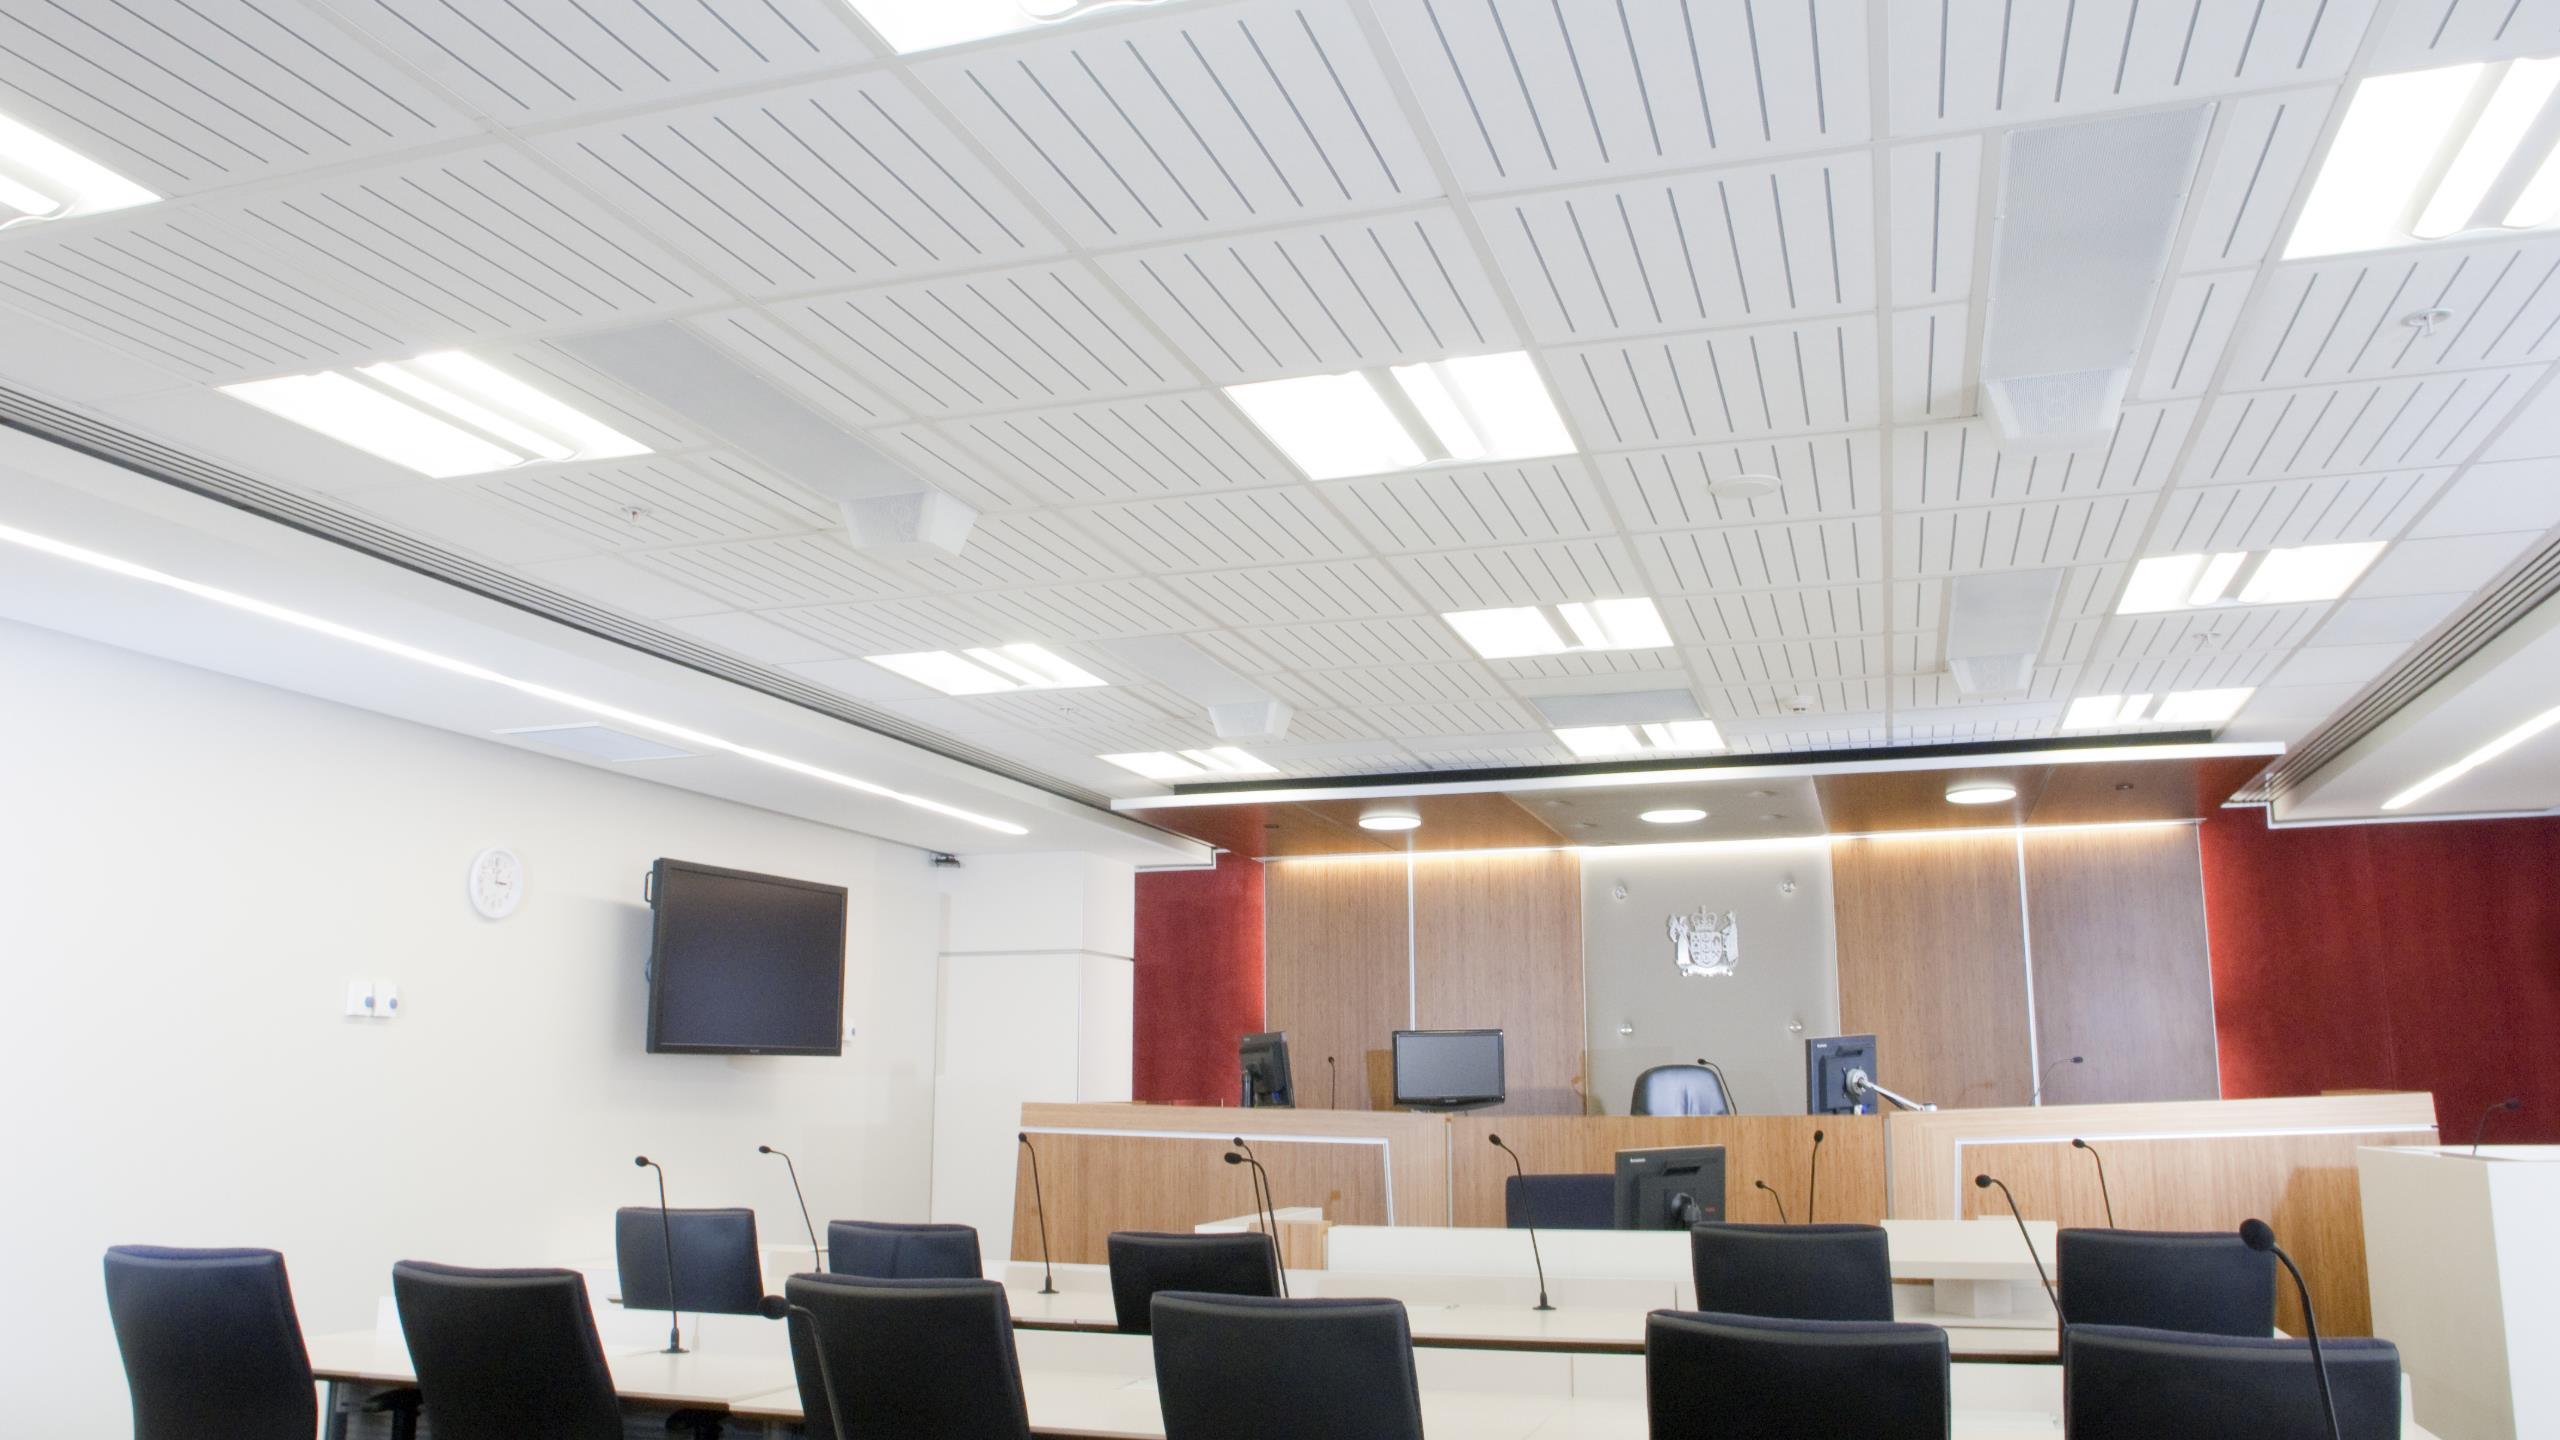 Auckland District Courts - Triton Duo 60 + Sonaris S7